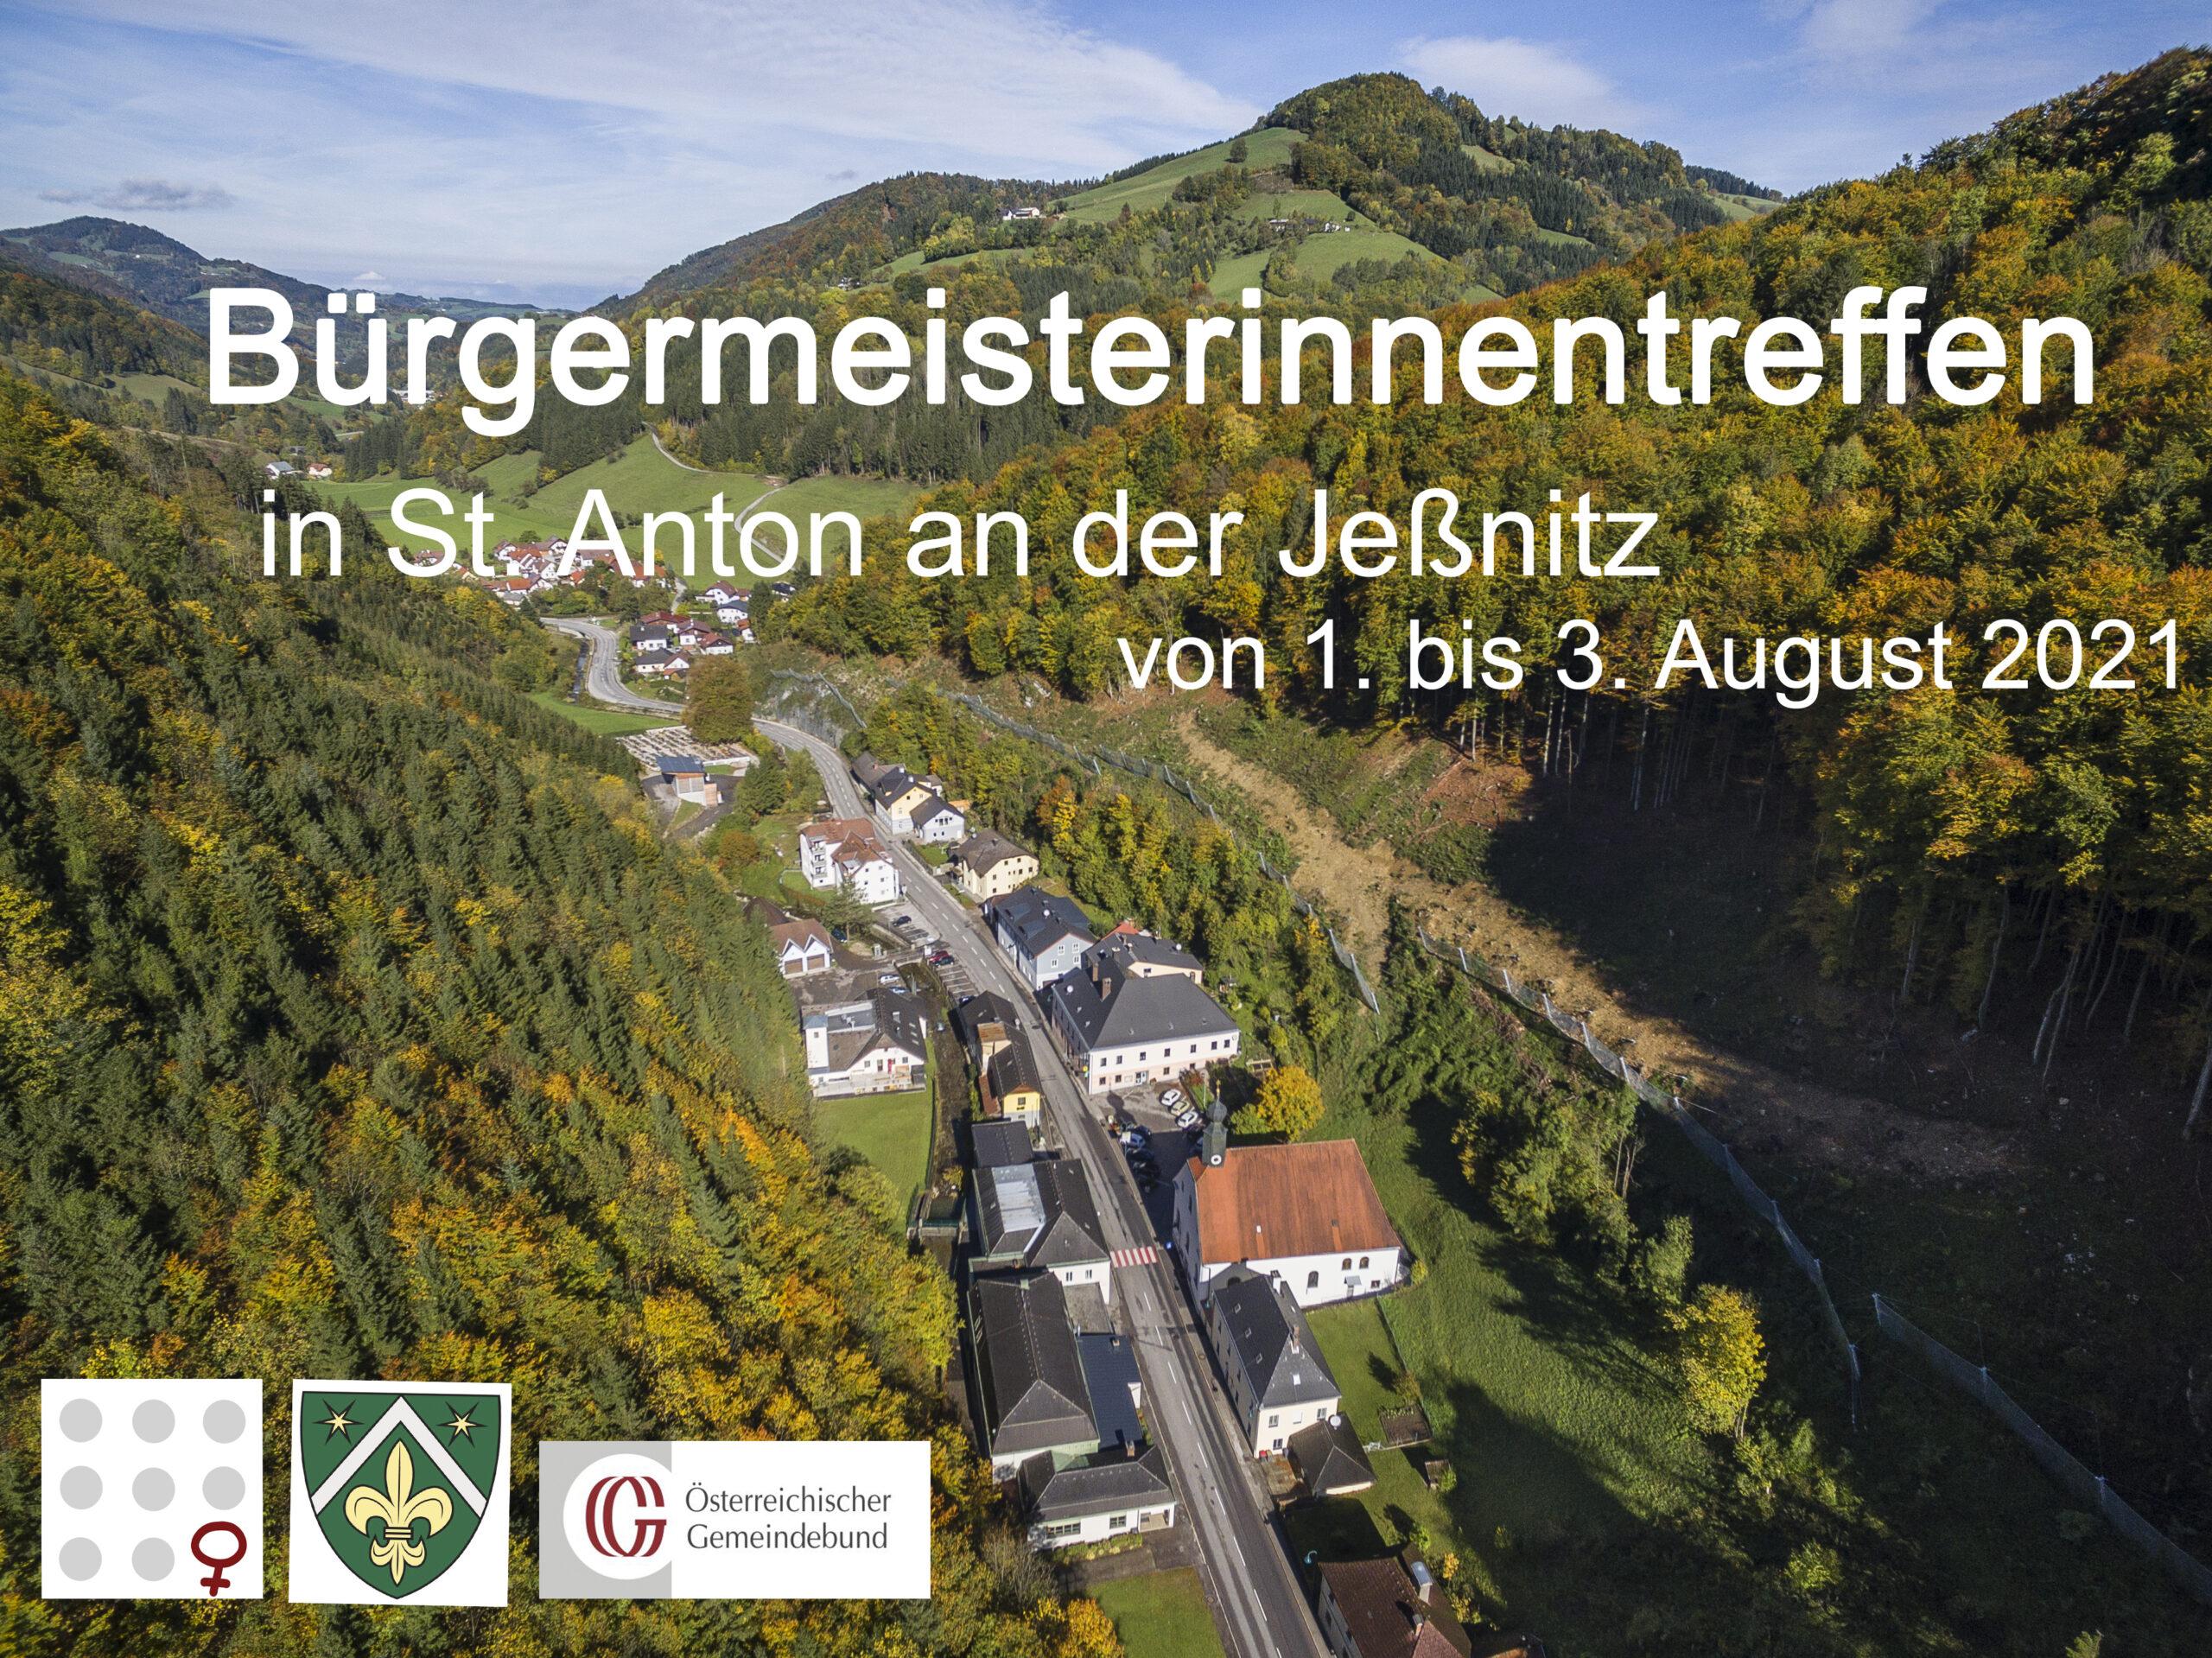 bgminnentreffen2021 sujet